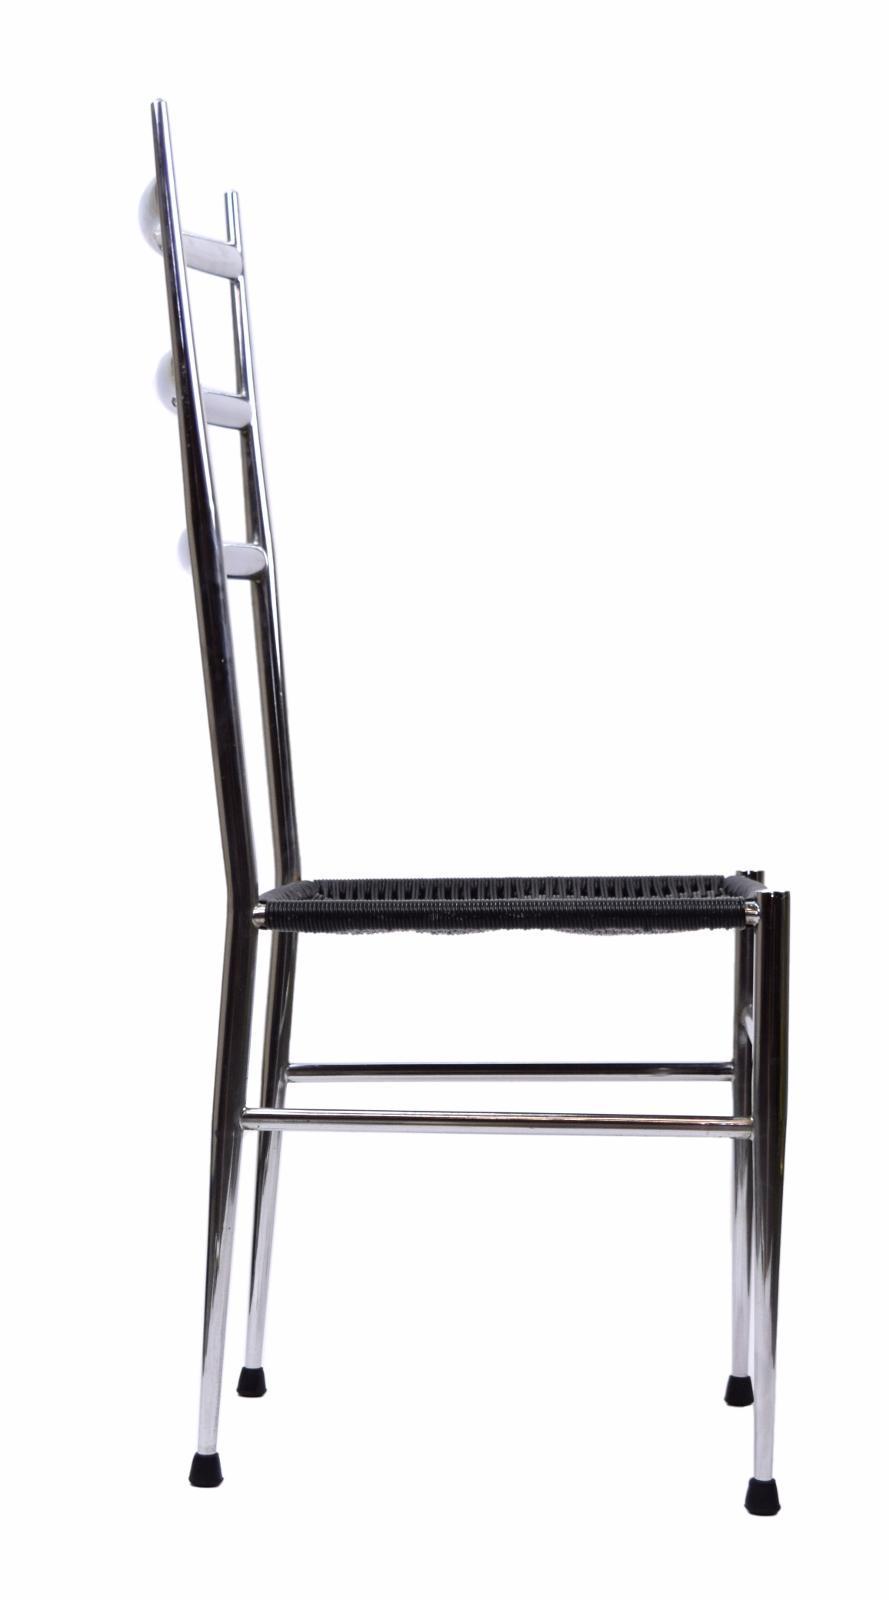 Italian Mid Century Modern Gio Ponti Style Dining Chairs   A Pair   Image 4